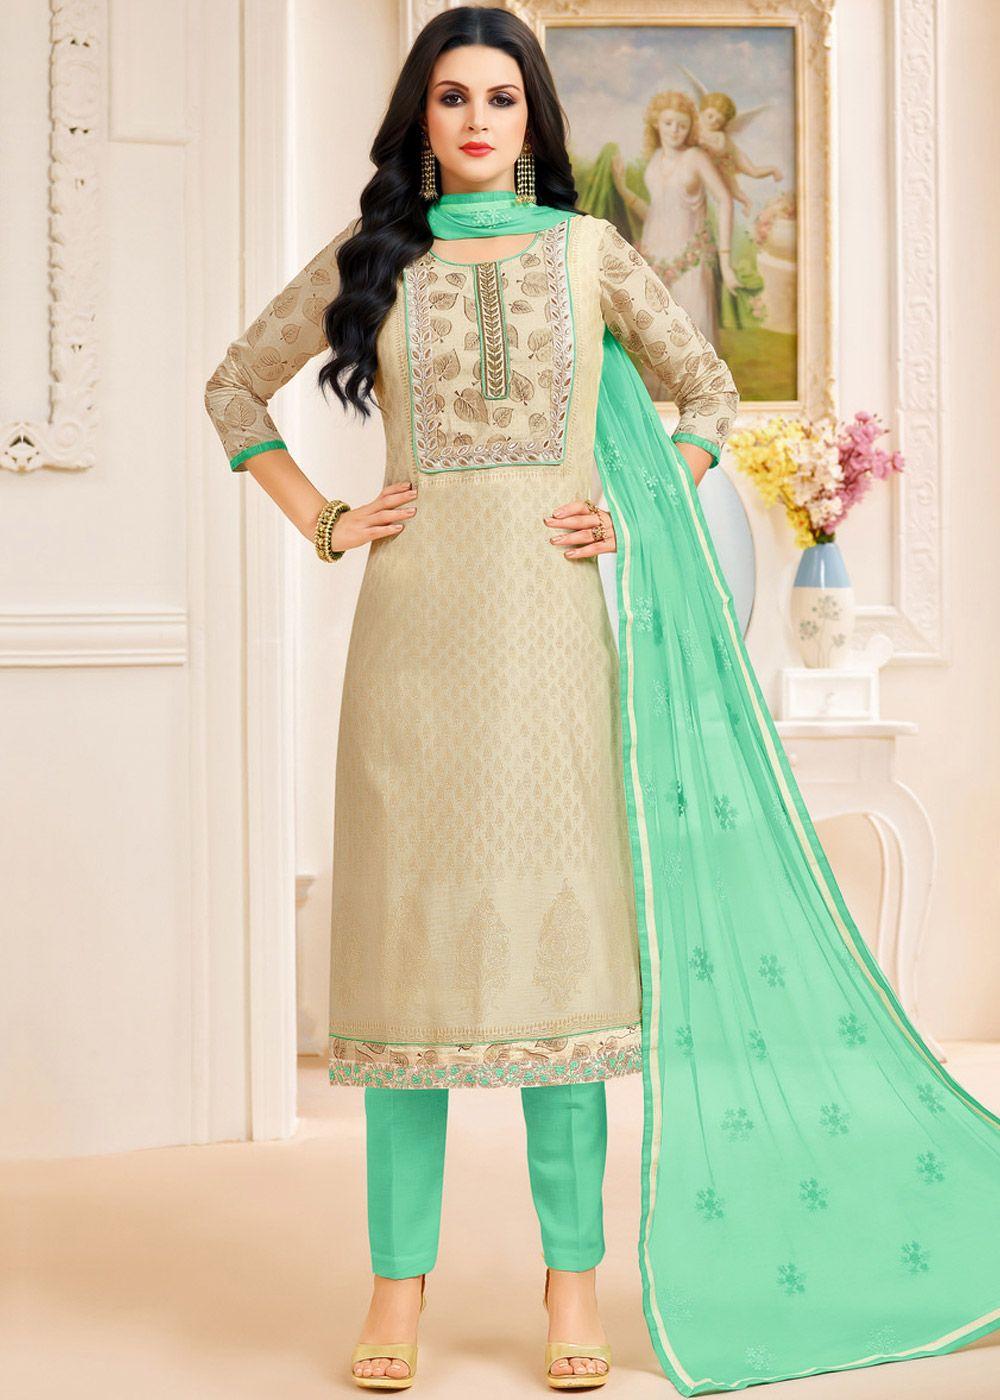 91ddefb4be Beige Chanderi Silk Pant Suit with Dupatta | Pant Style Suits ...